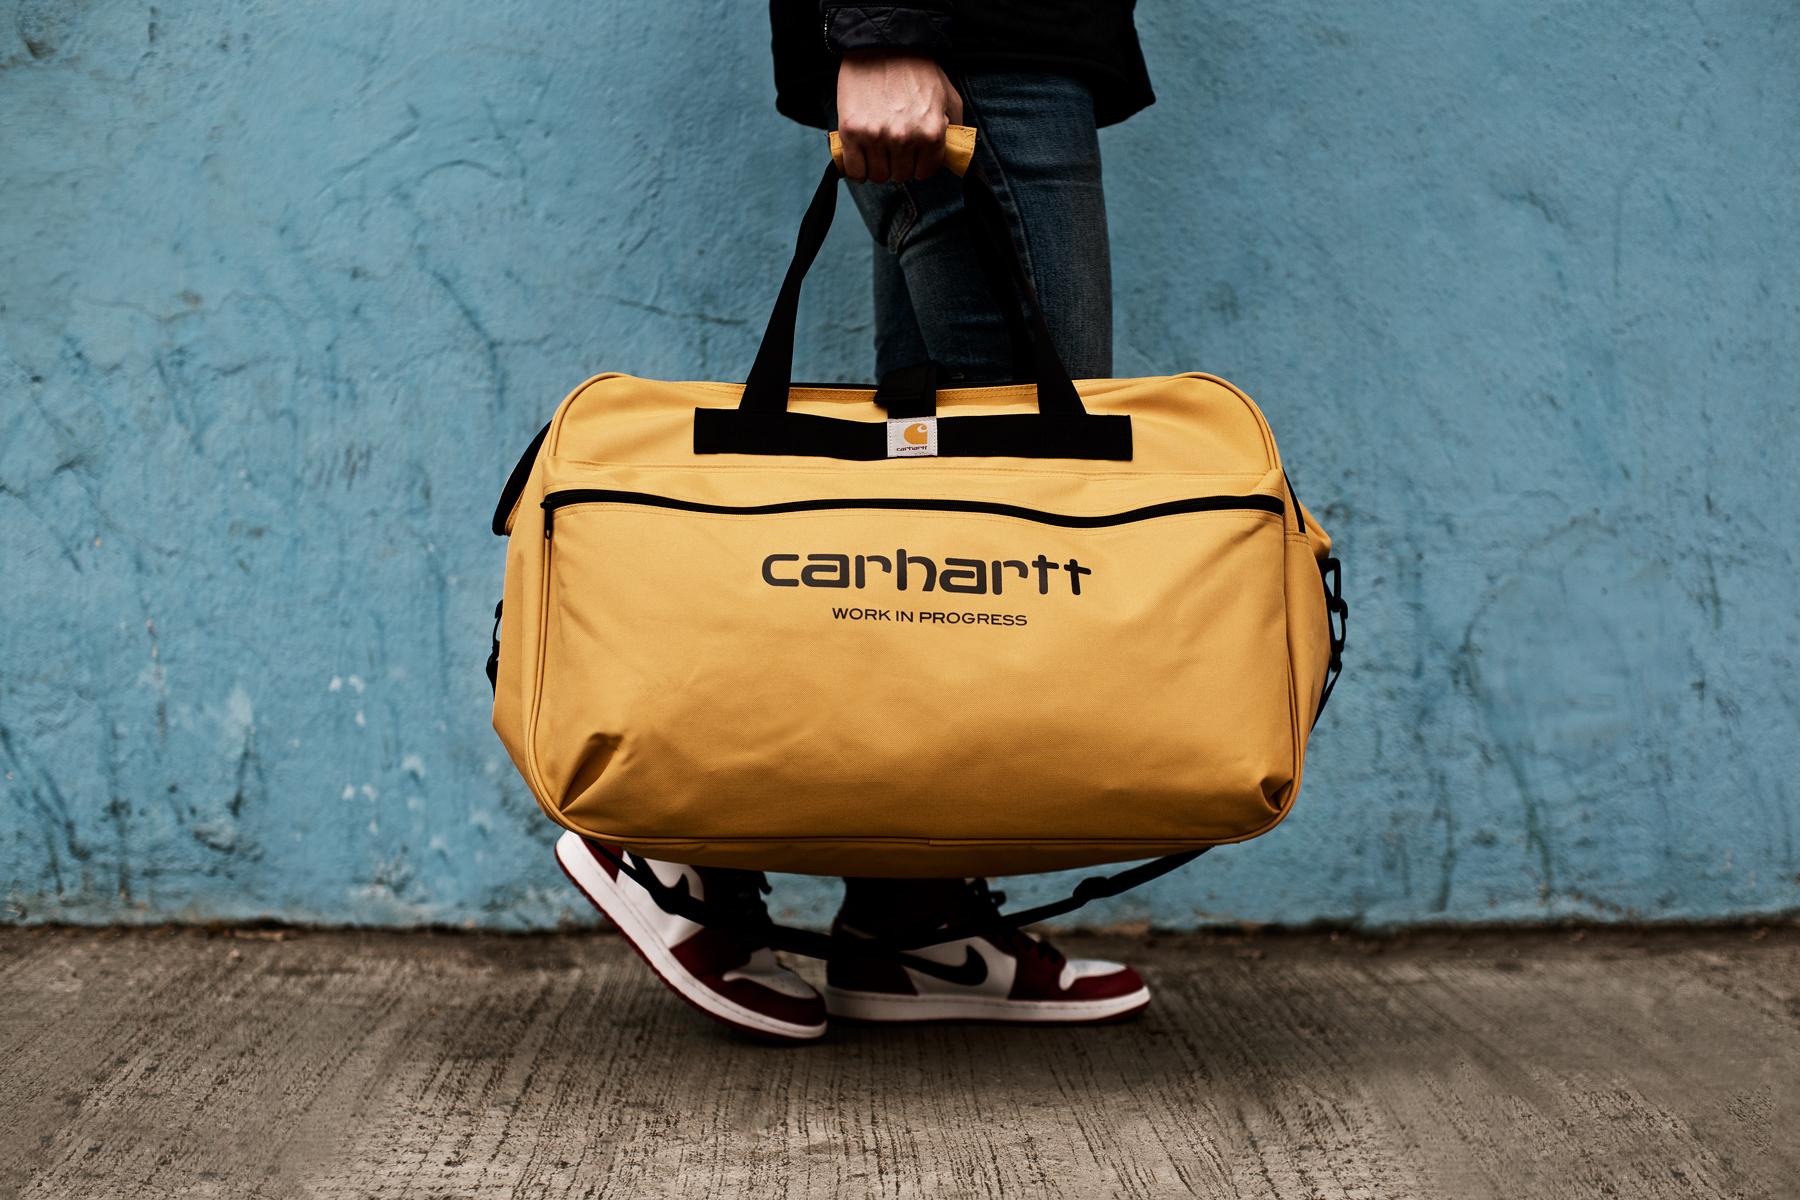 Carhartt WIP 2014 Spring/Summer Duffle Bags